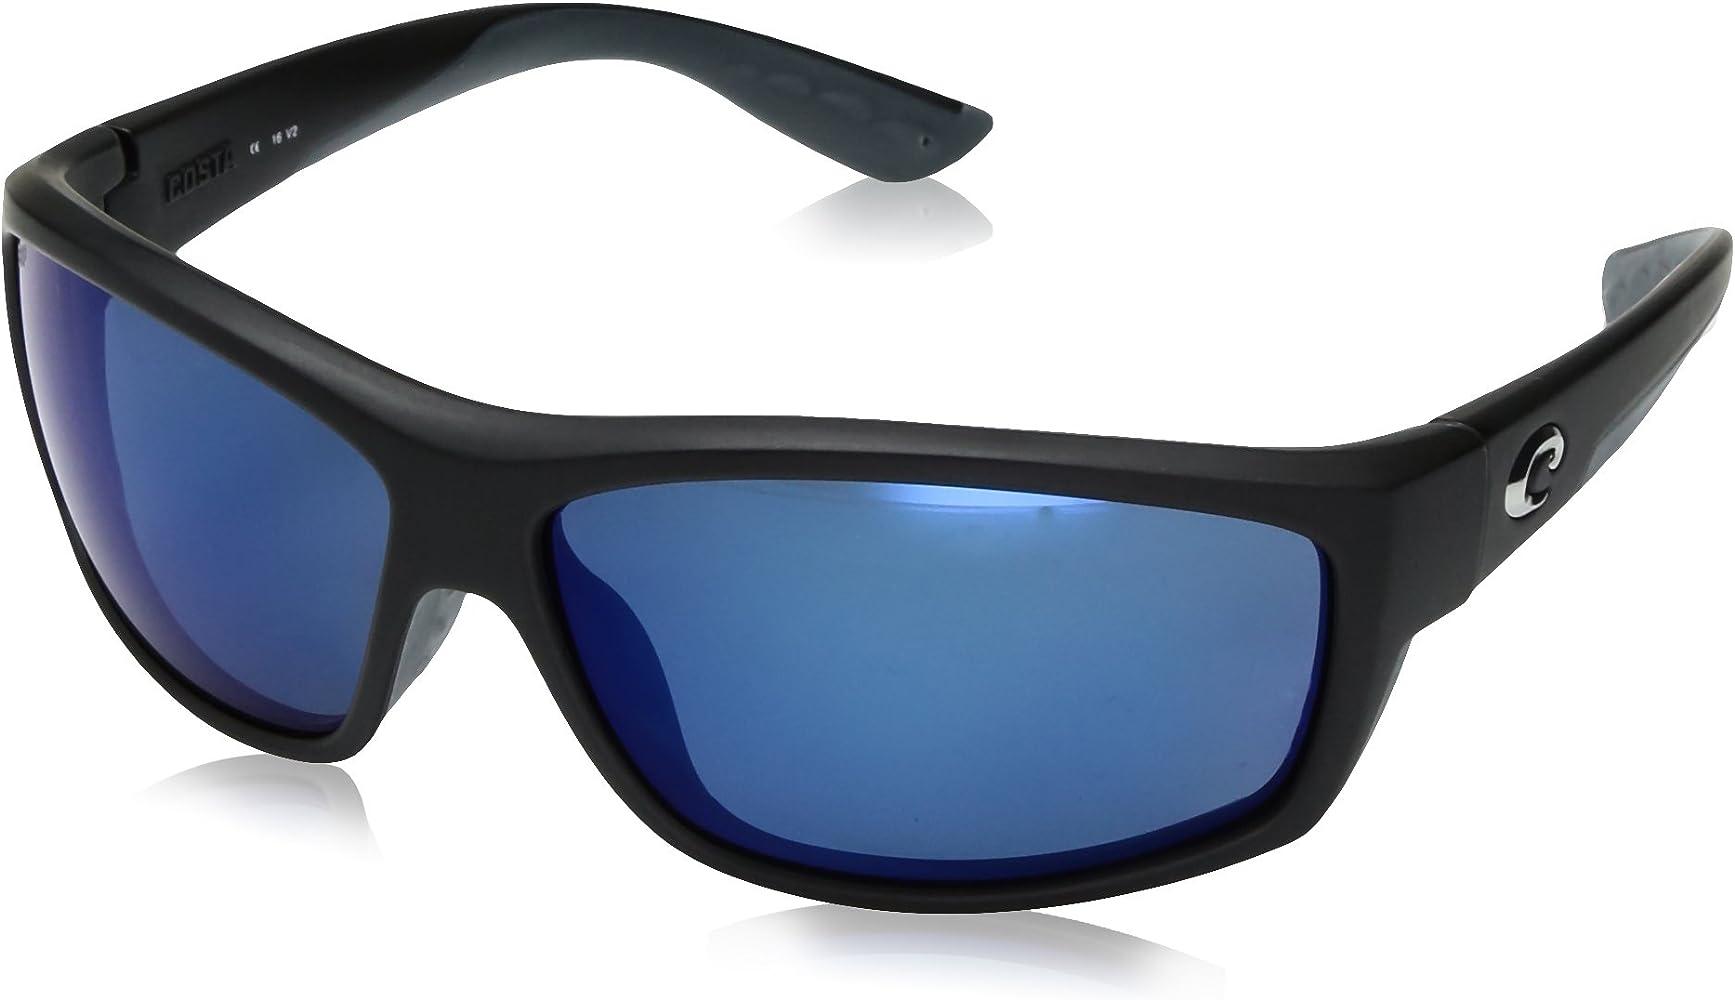 690da43e7a9d Costa Del Mar Saltbreak 580P Saltbreak, Black Blue Mirror, Blue Mirror